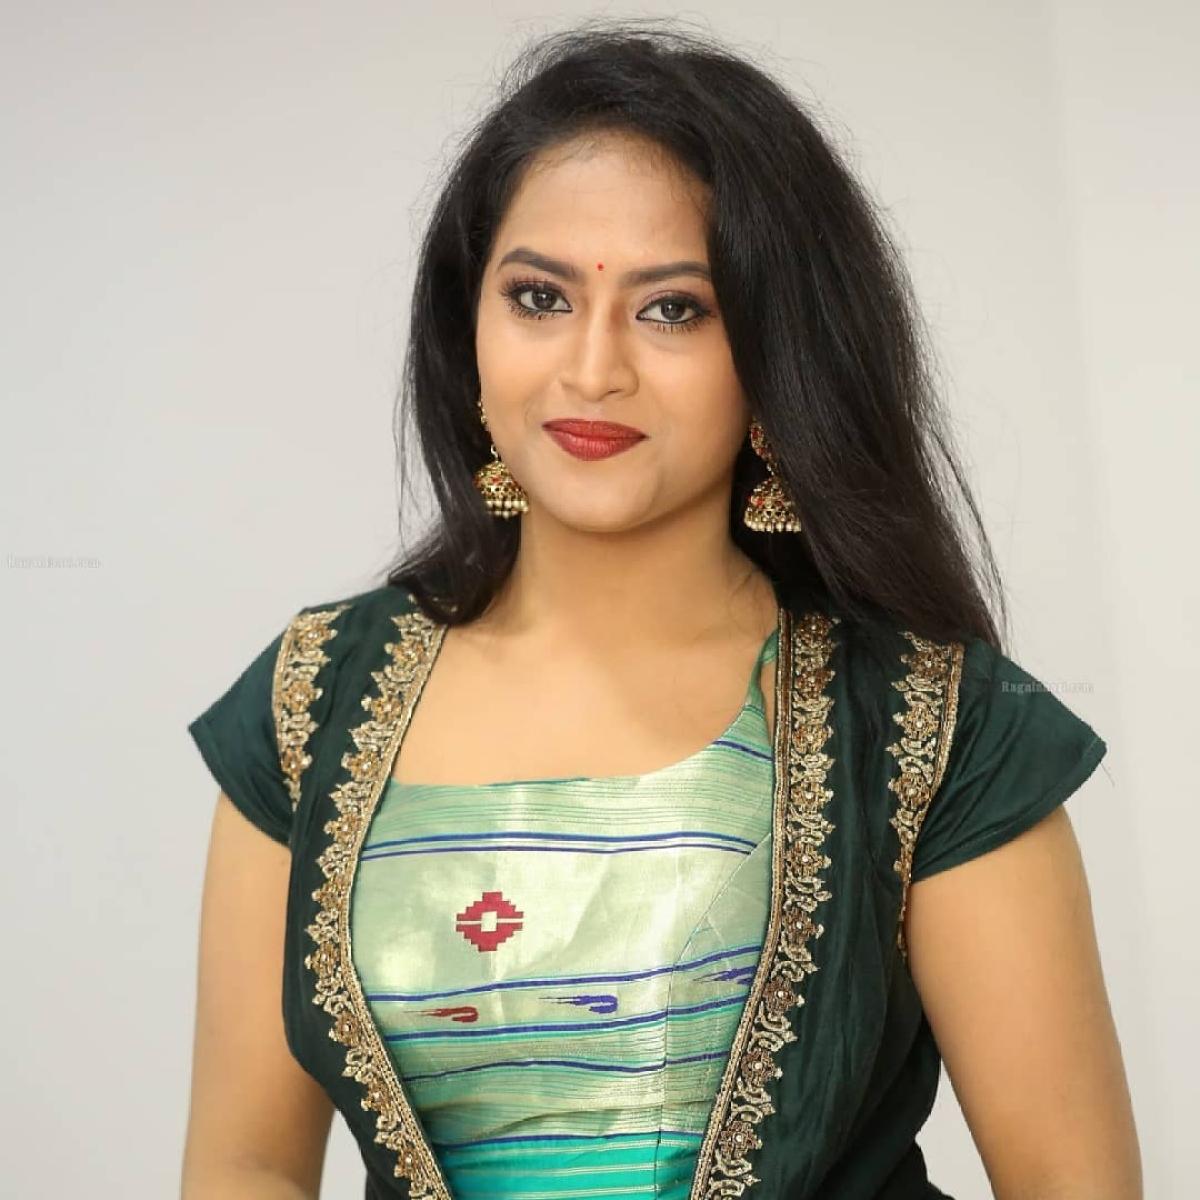 Telugu TV actress Sravani Kondapalli, 26, commits suicide